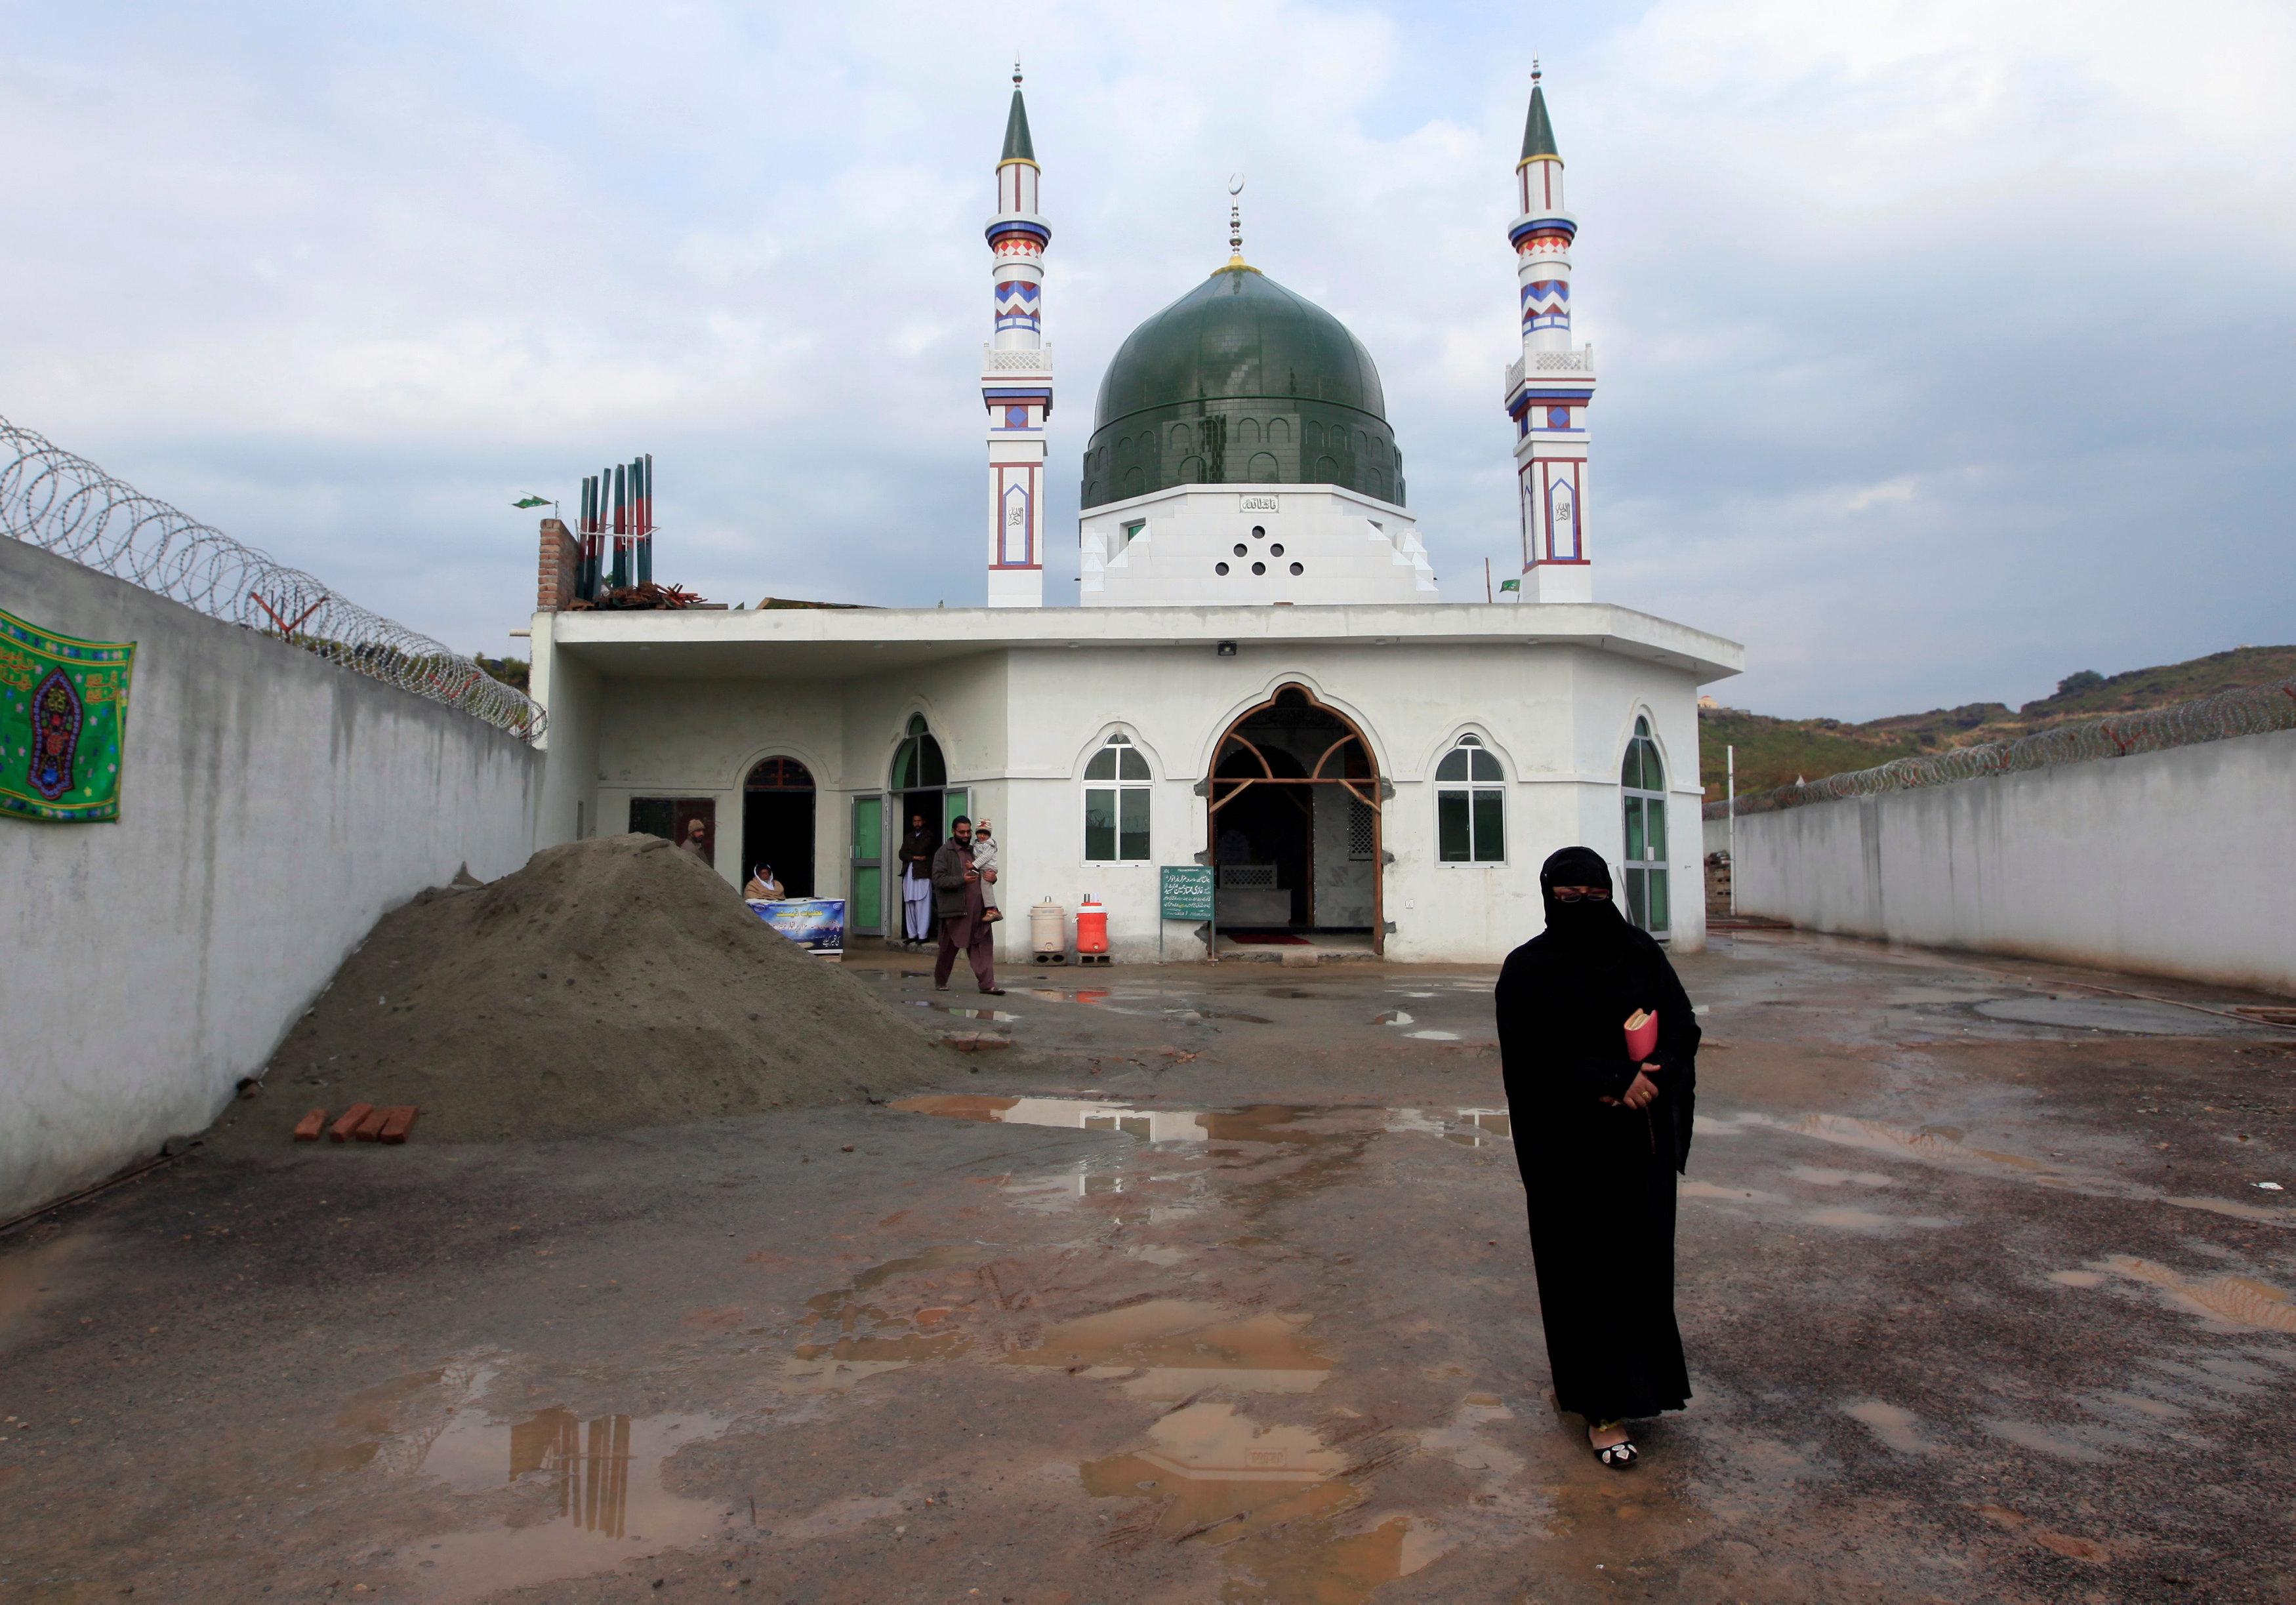 Pakistani women kill man accused of blasphemy a decade ago – police